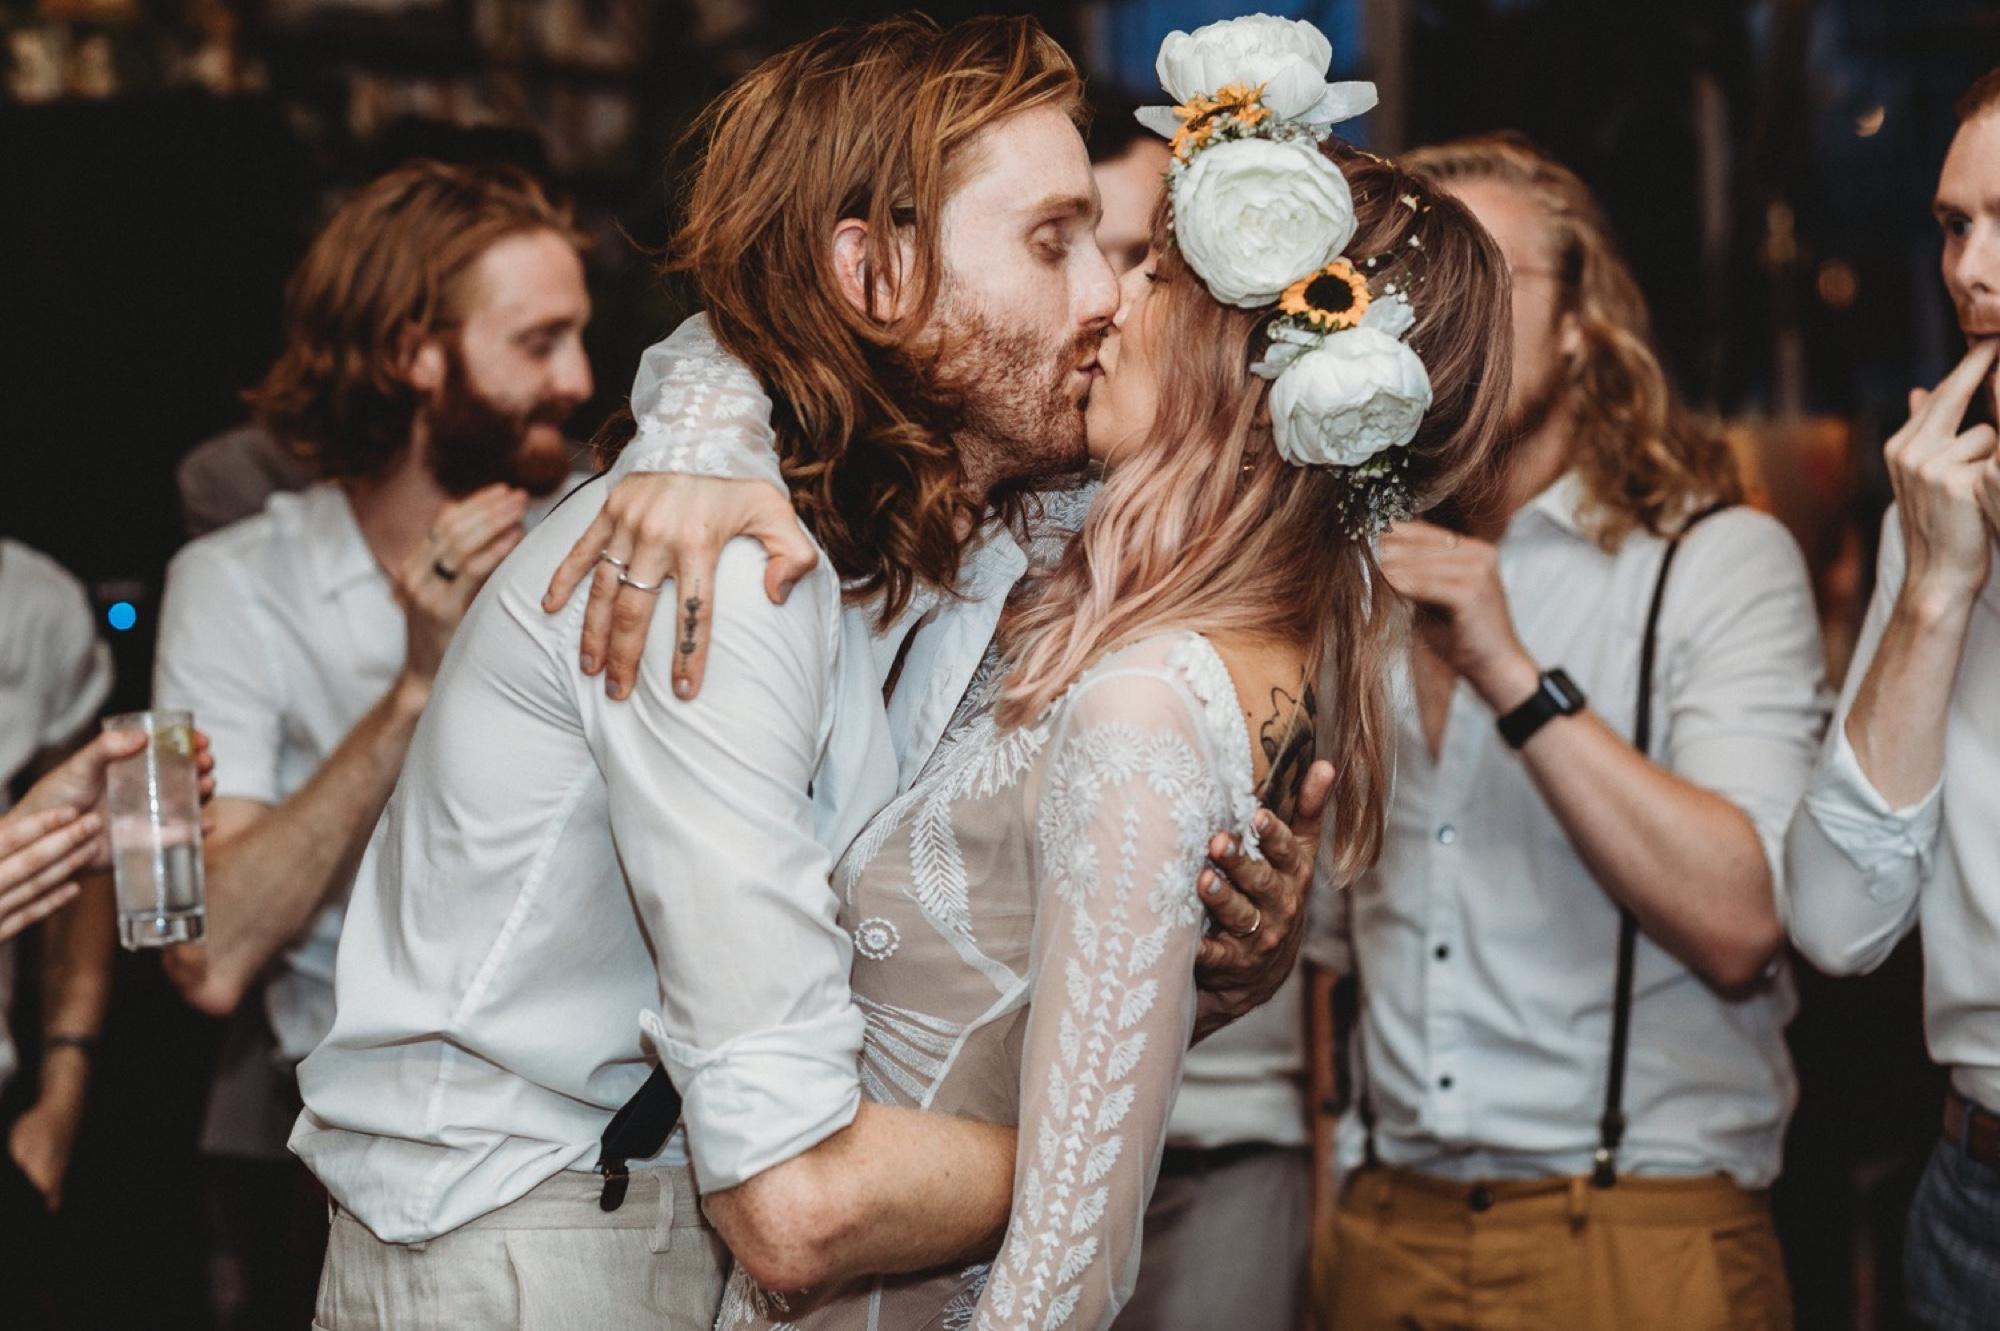 hackney London wedding reception Wringer and Mangle by zakas photography